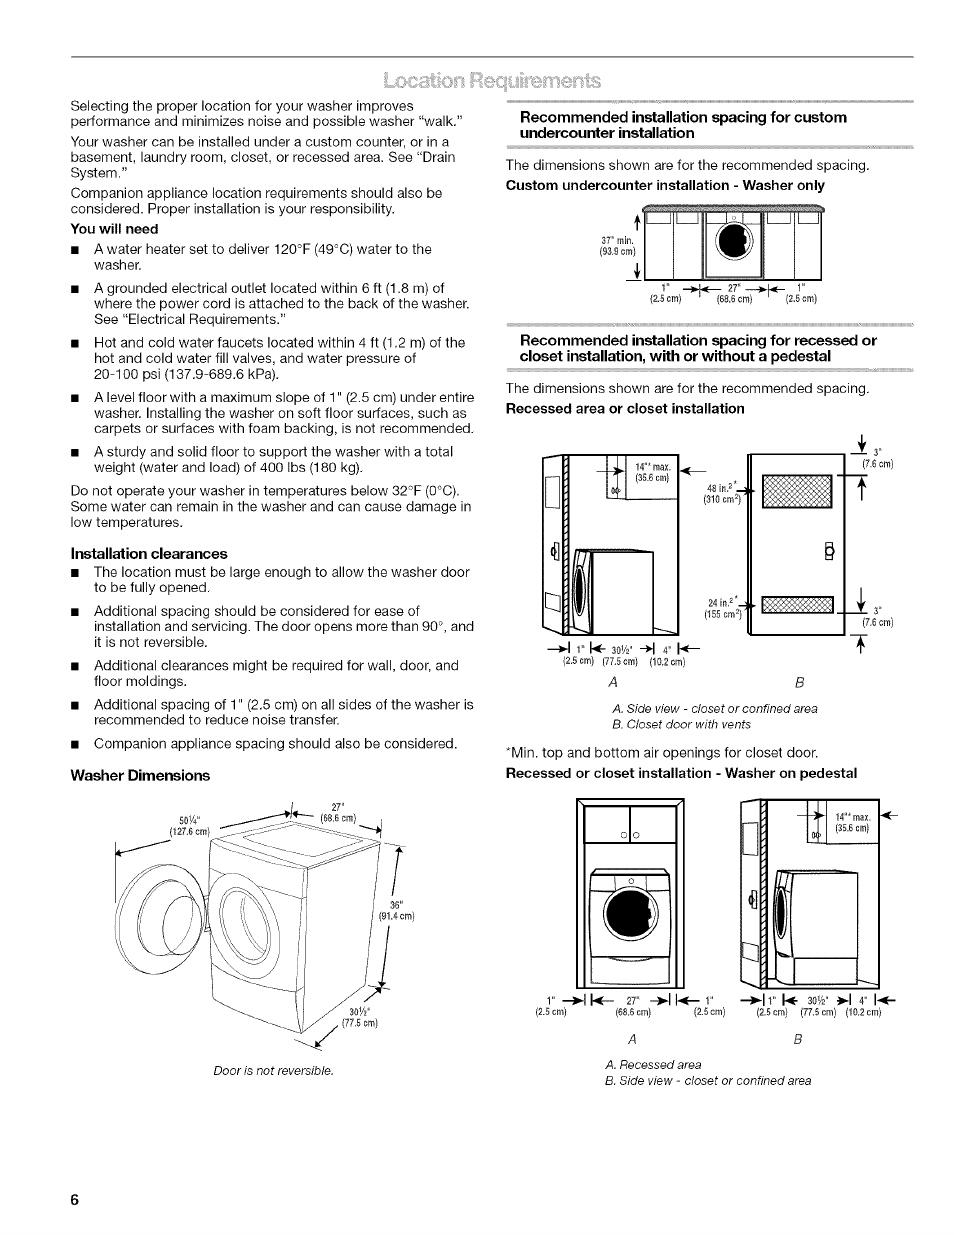 Installation clearances | Kenmore HE2 PLUS User Manual ... on kenmore dryer timer knob, kenmore elite dryer, kenmore gas dryer, kenmore oasis dryer, kenmore he dryer, kenmore washer and dryer, kenmore he5 dryer, kenmore he4 dryer, kenmore front load washer dryer, kenmore dryer model 110 parts, kenmore dryer 110 troubleshooting, kenmore 80 series dryer, kenmore super capacity dryer, kenmore he3 dryer,